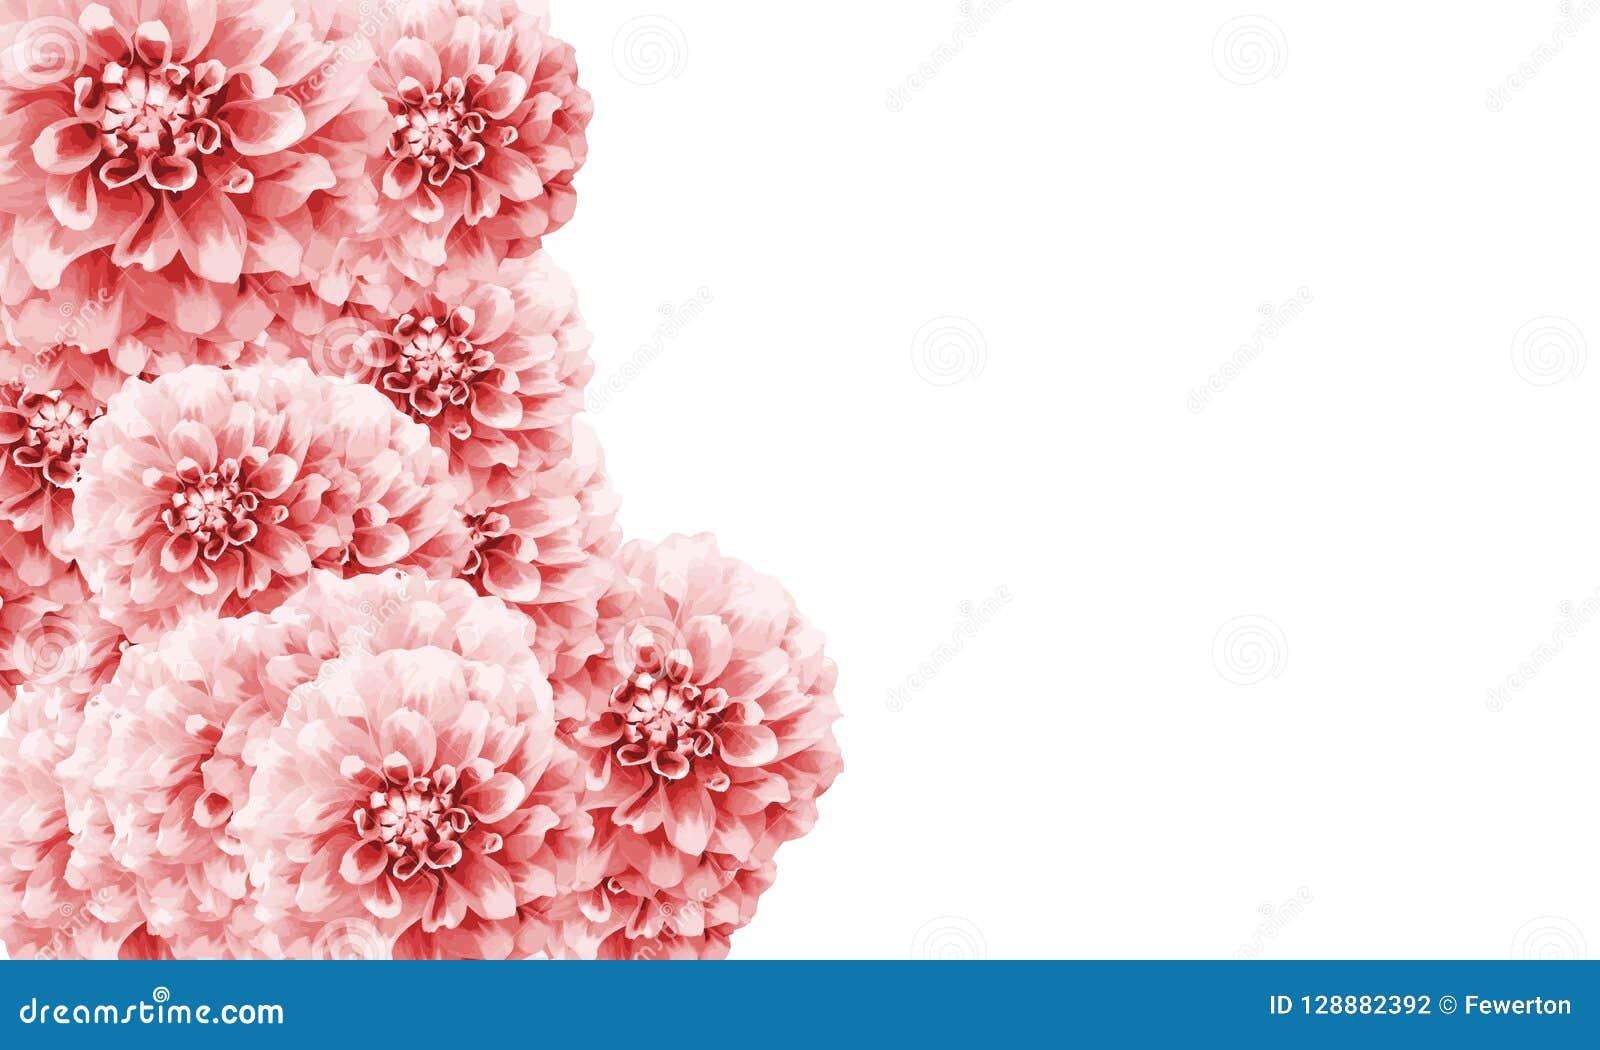 Dahlia Floral Border Frame Background With Light Pink White Dahlia